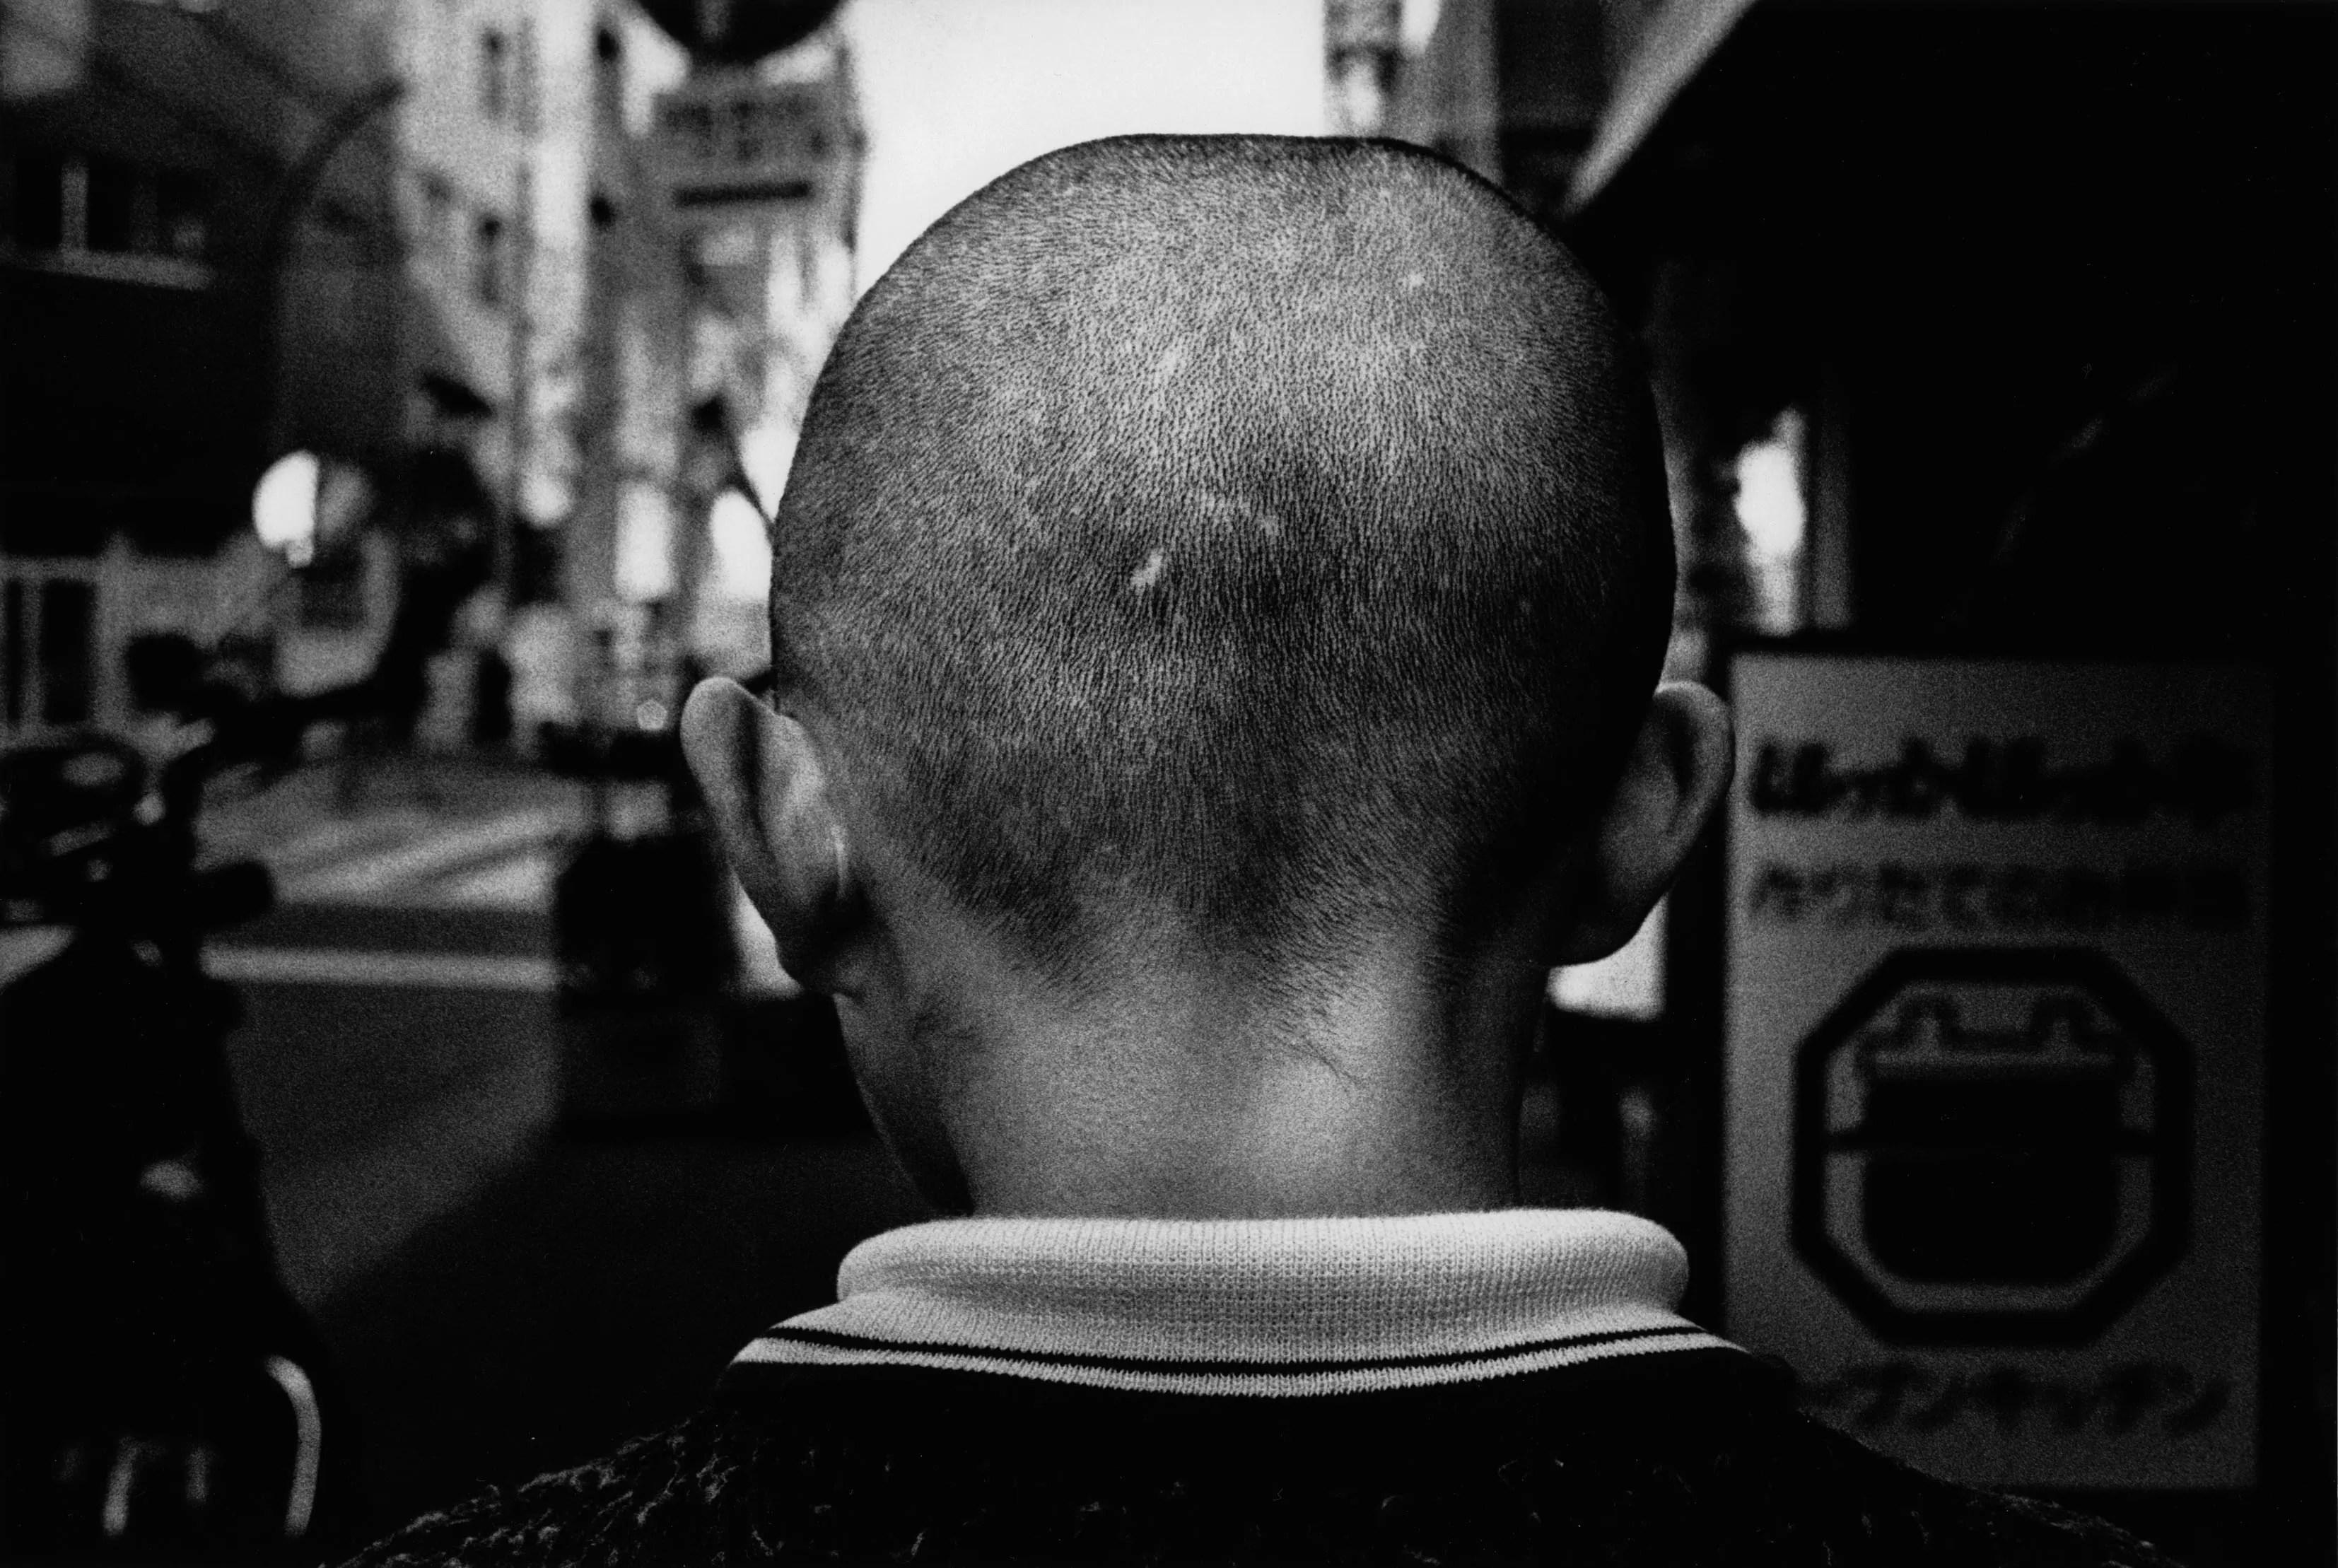 tate 5 - Daido Moriyama  Street Photography - fotostreet.it